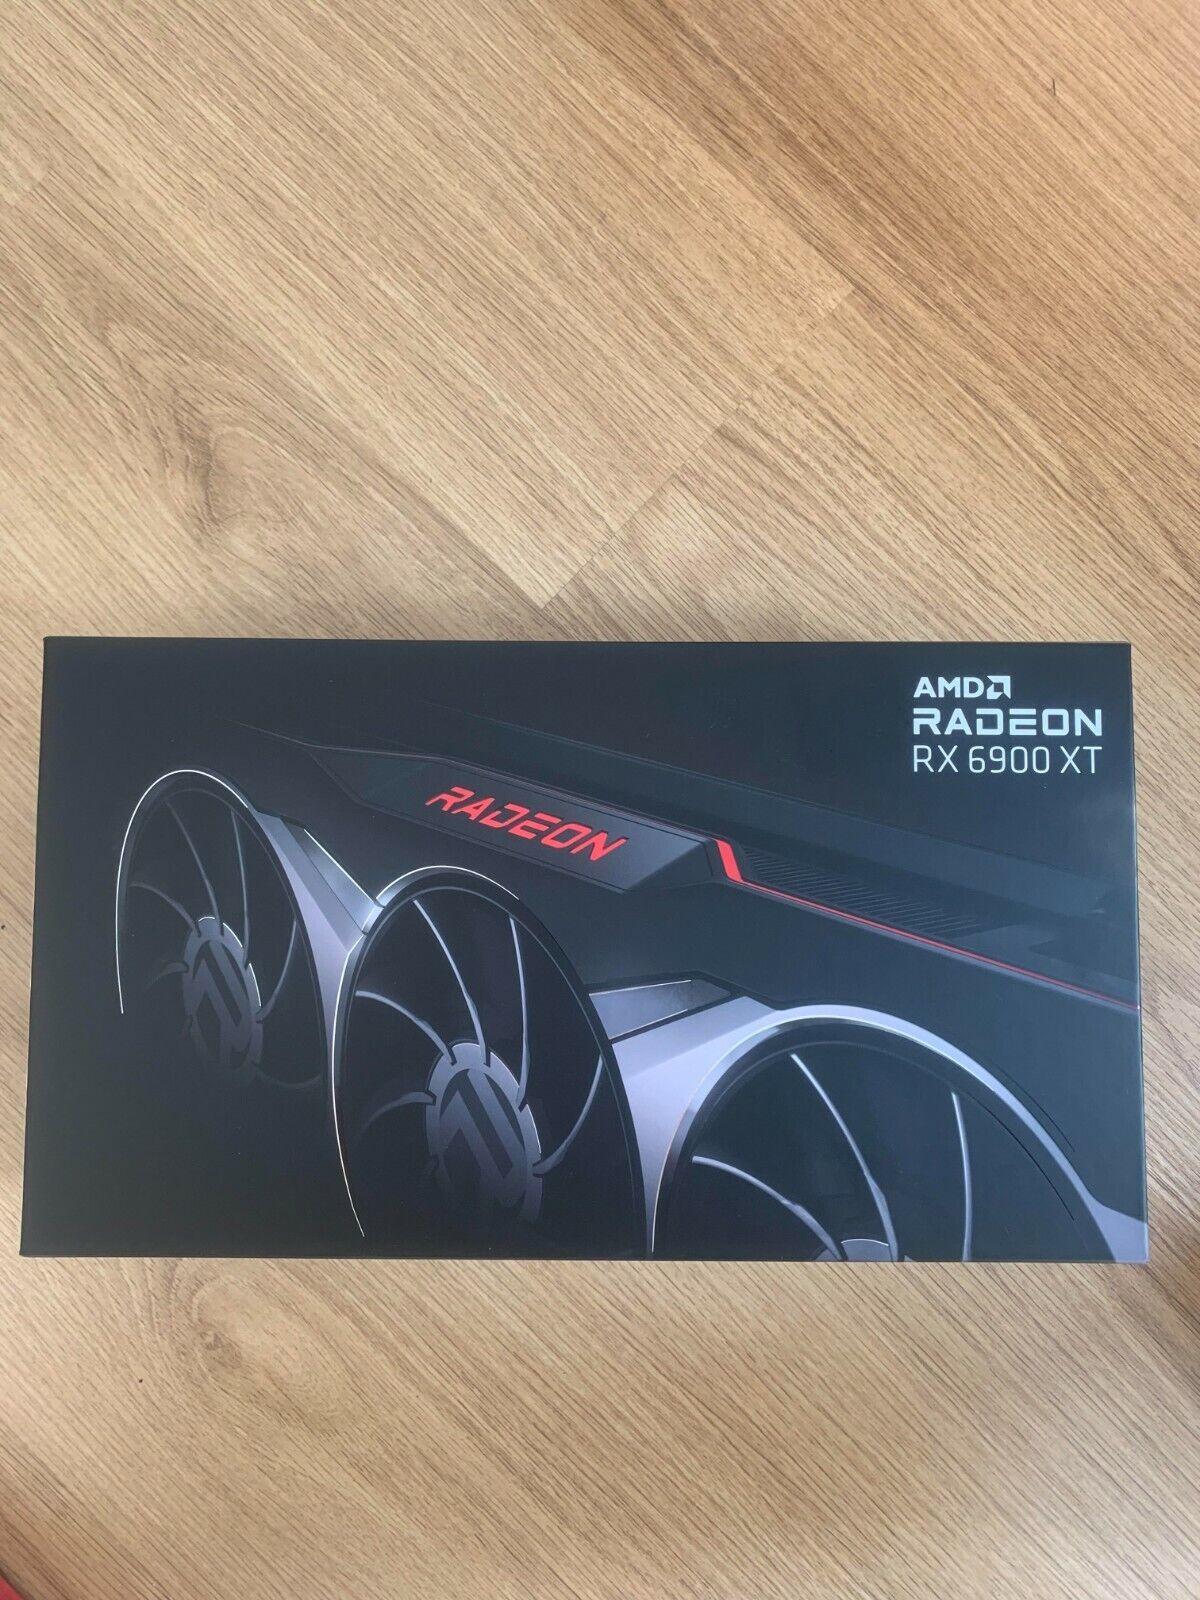 AMD Radeon RX 6900 XT - Grafikkarte - GDDR6 - 16 GB - NEU & OVP -